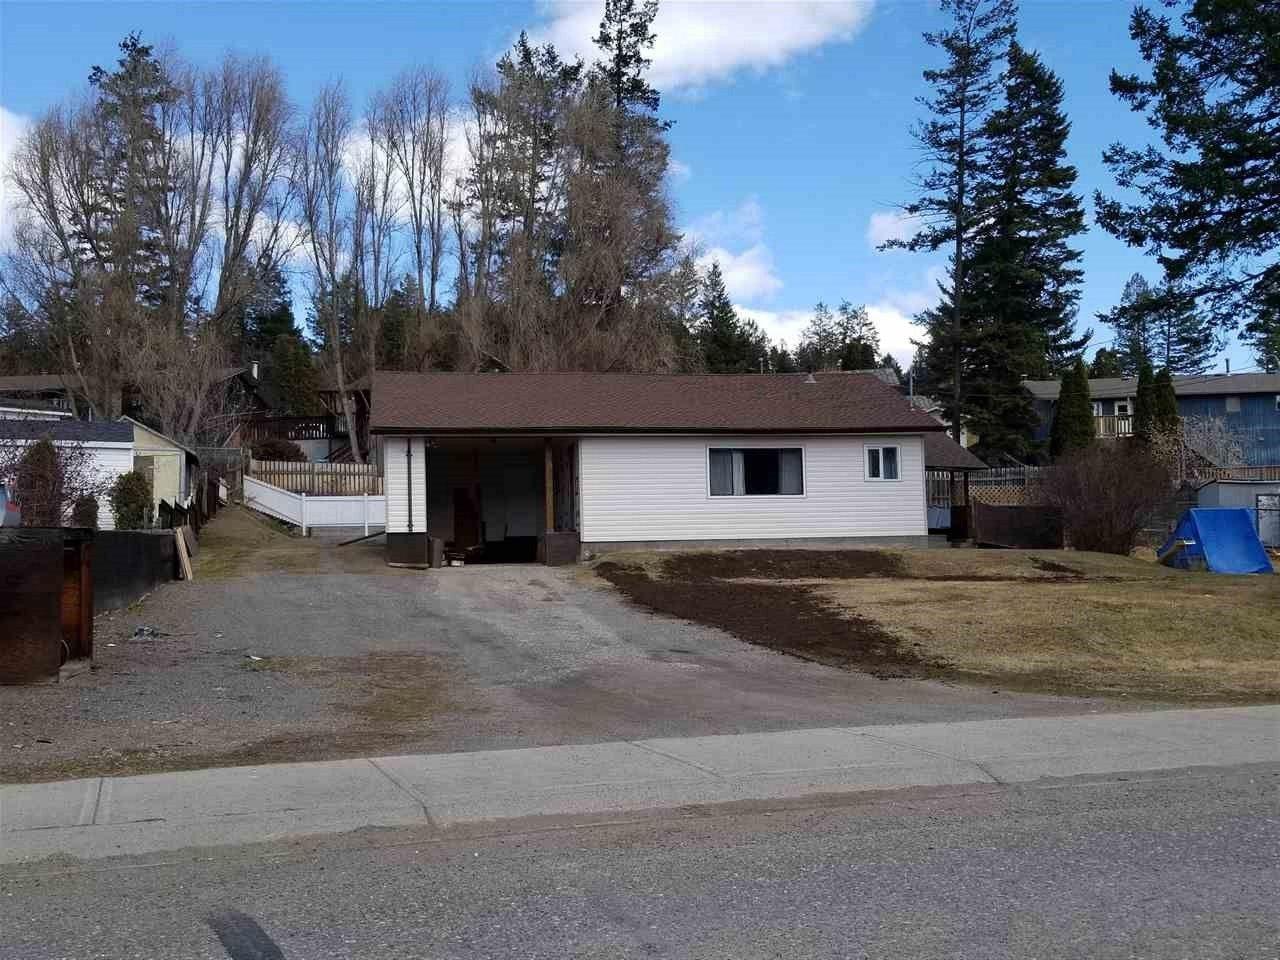 Main Photo: 1038 DAIRY Road in Williams Lake: Williams Lake - City House for sale (Williams Lake (Zone 27))  : MLS®# R2450281